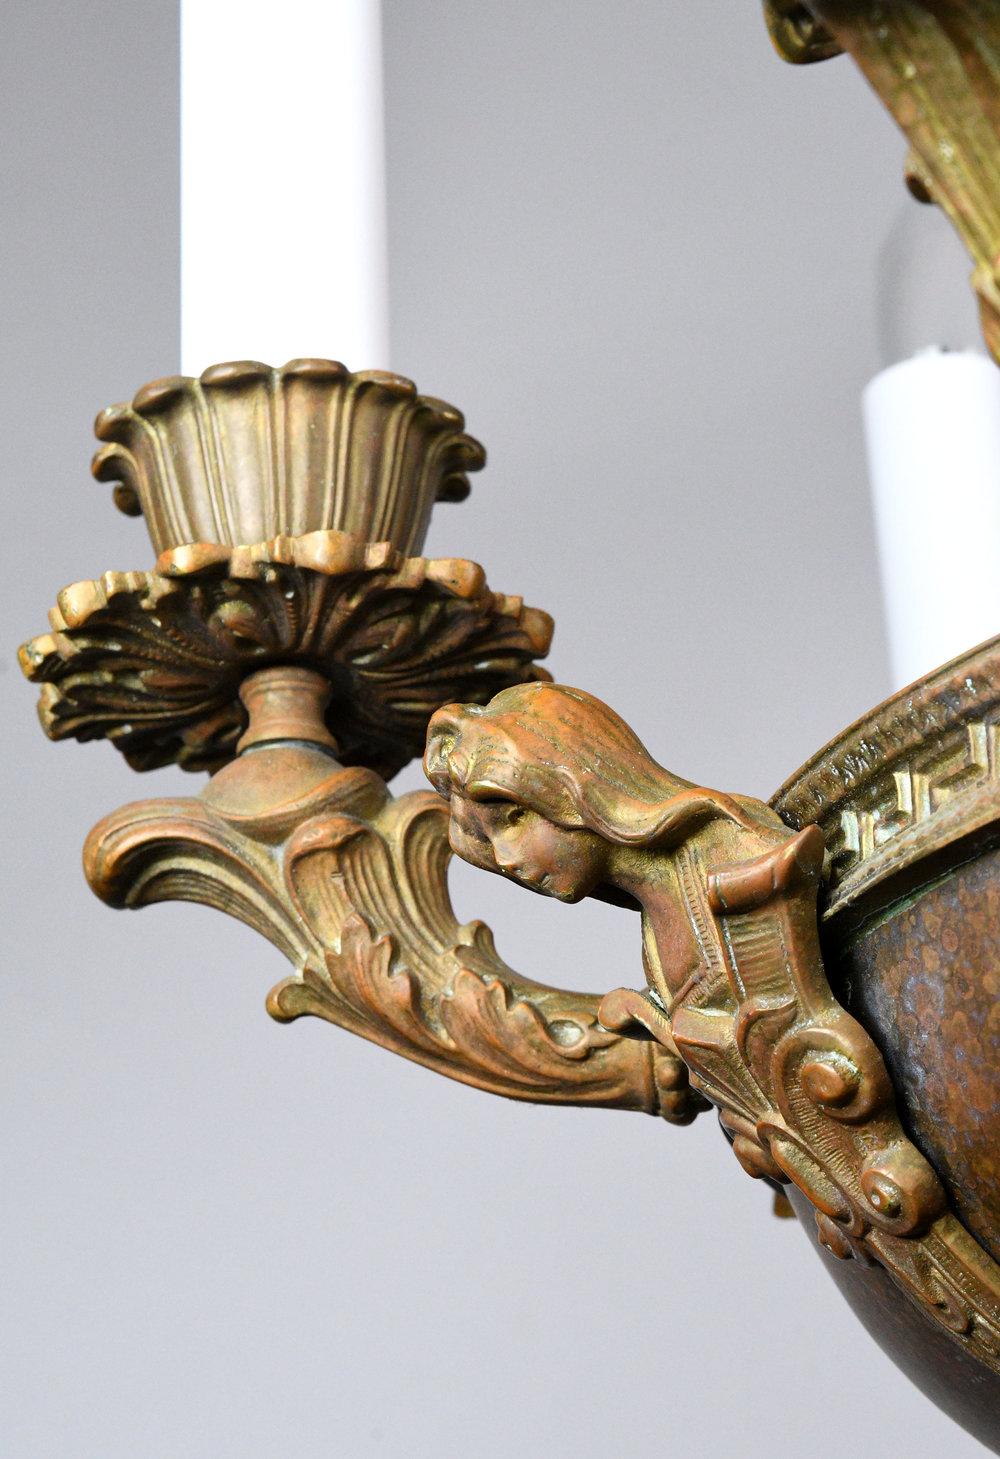 47592-figural-bronze-6-candle-chandelier-woman-profile.jpg